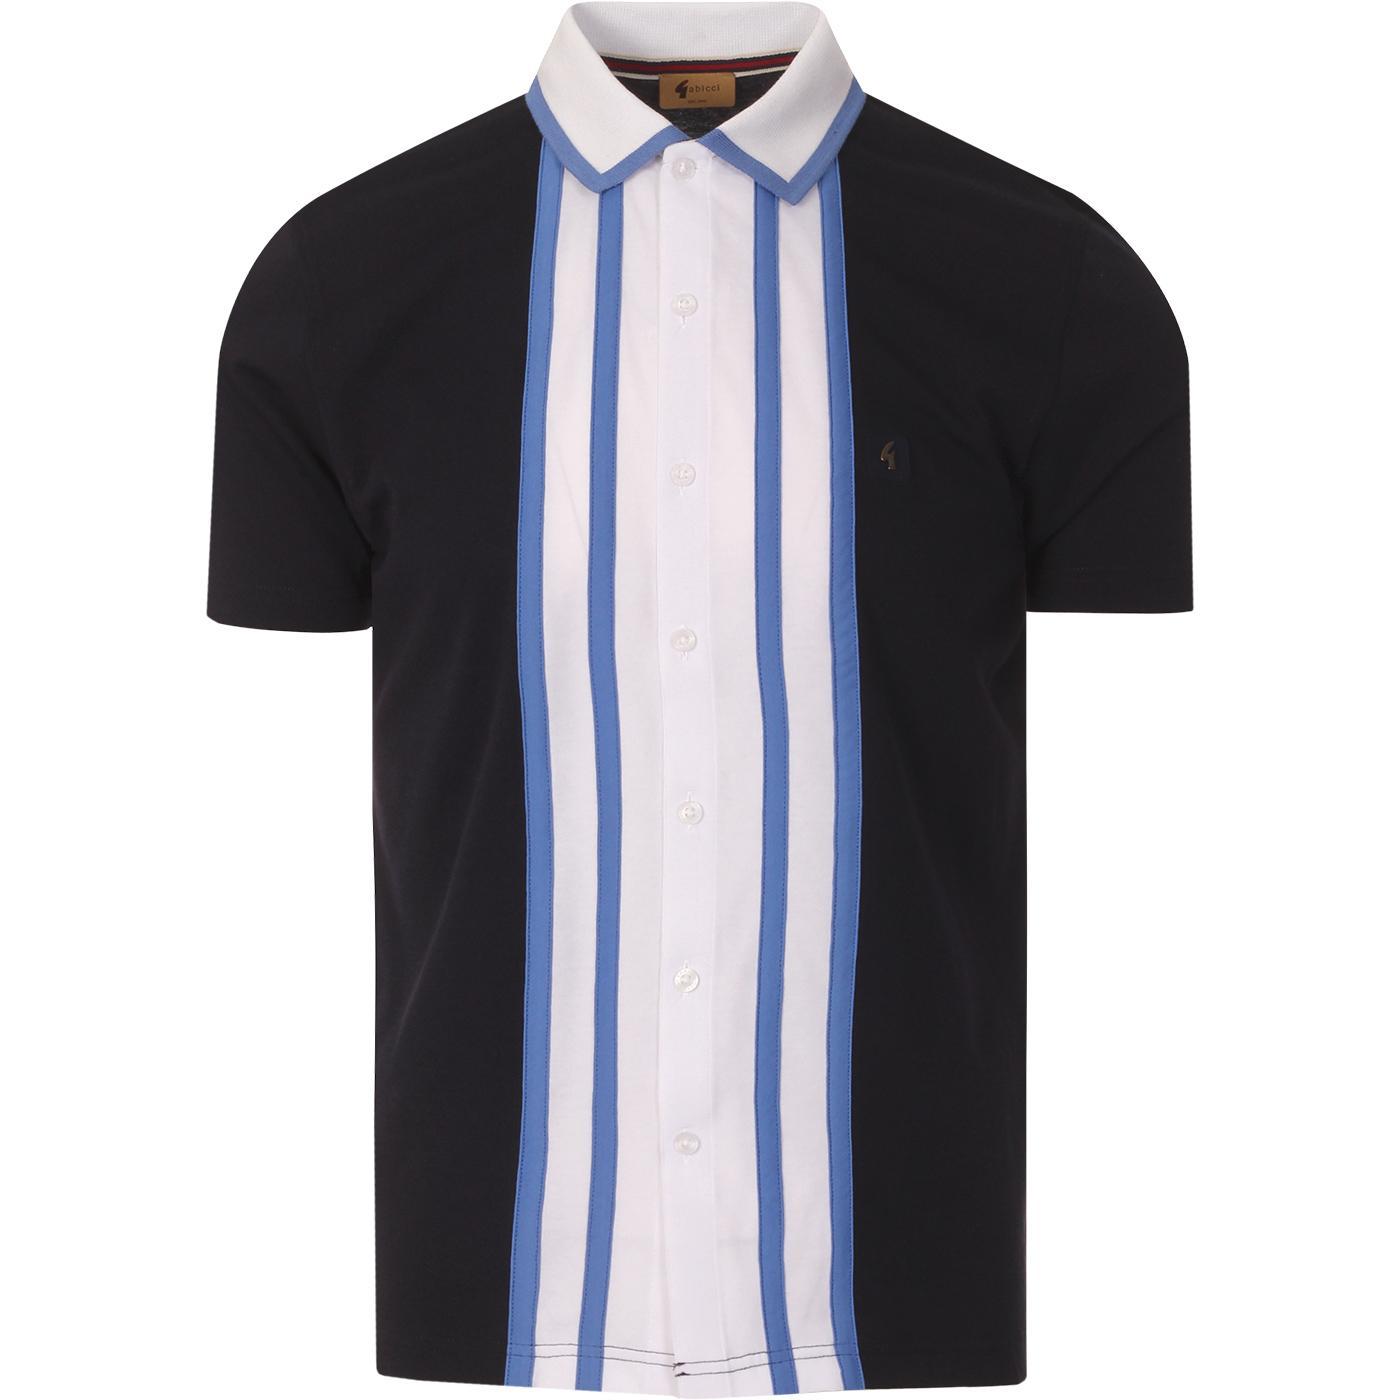 Statham GABICCI VINTAGE Retro Mod Jersey Shirt N